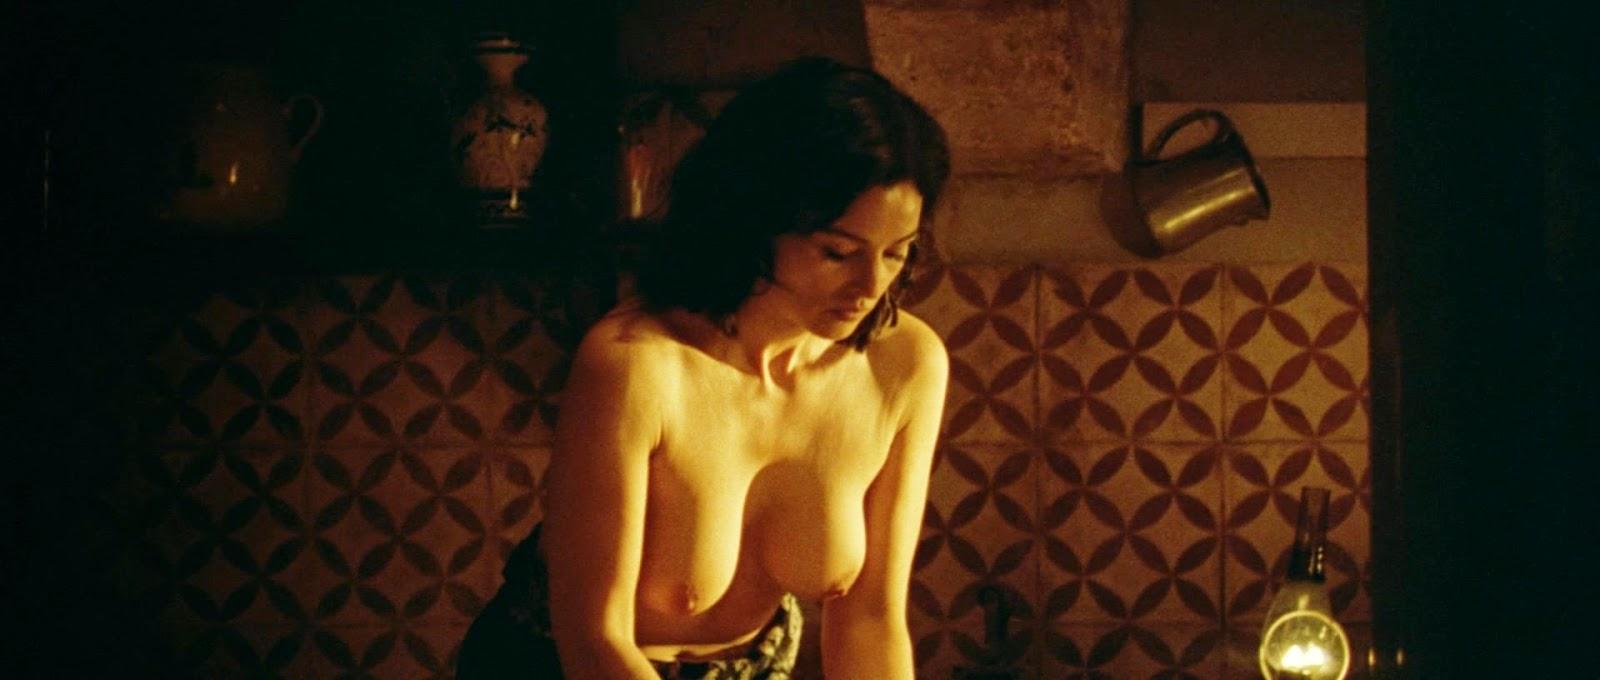 Monica bellucci boobs combien tu maimes